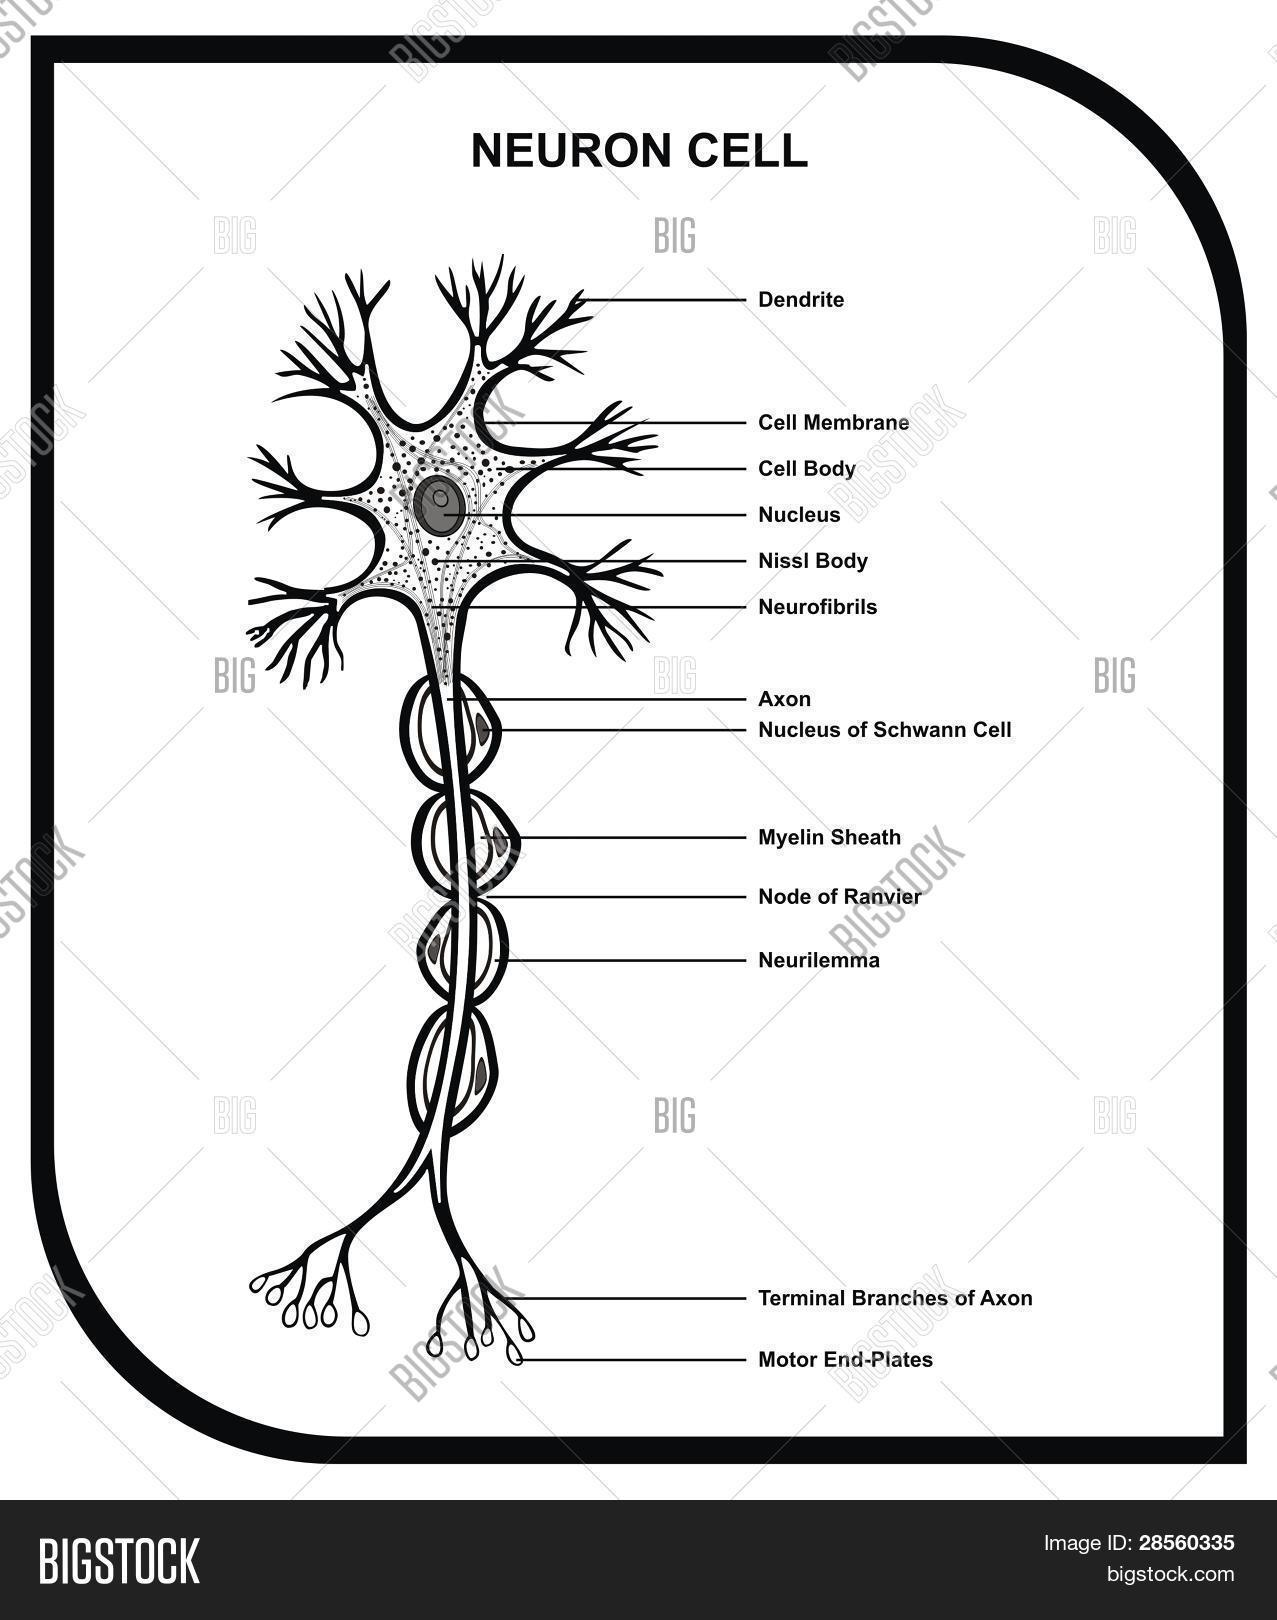 Human Neuron Cell